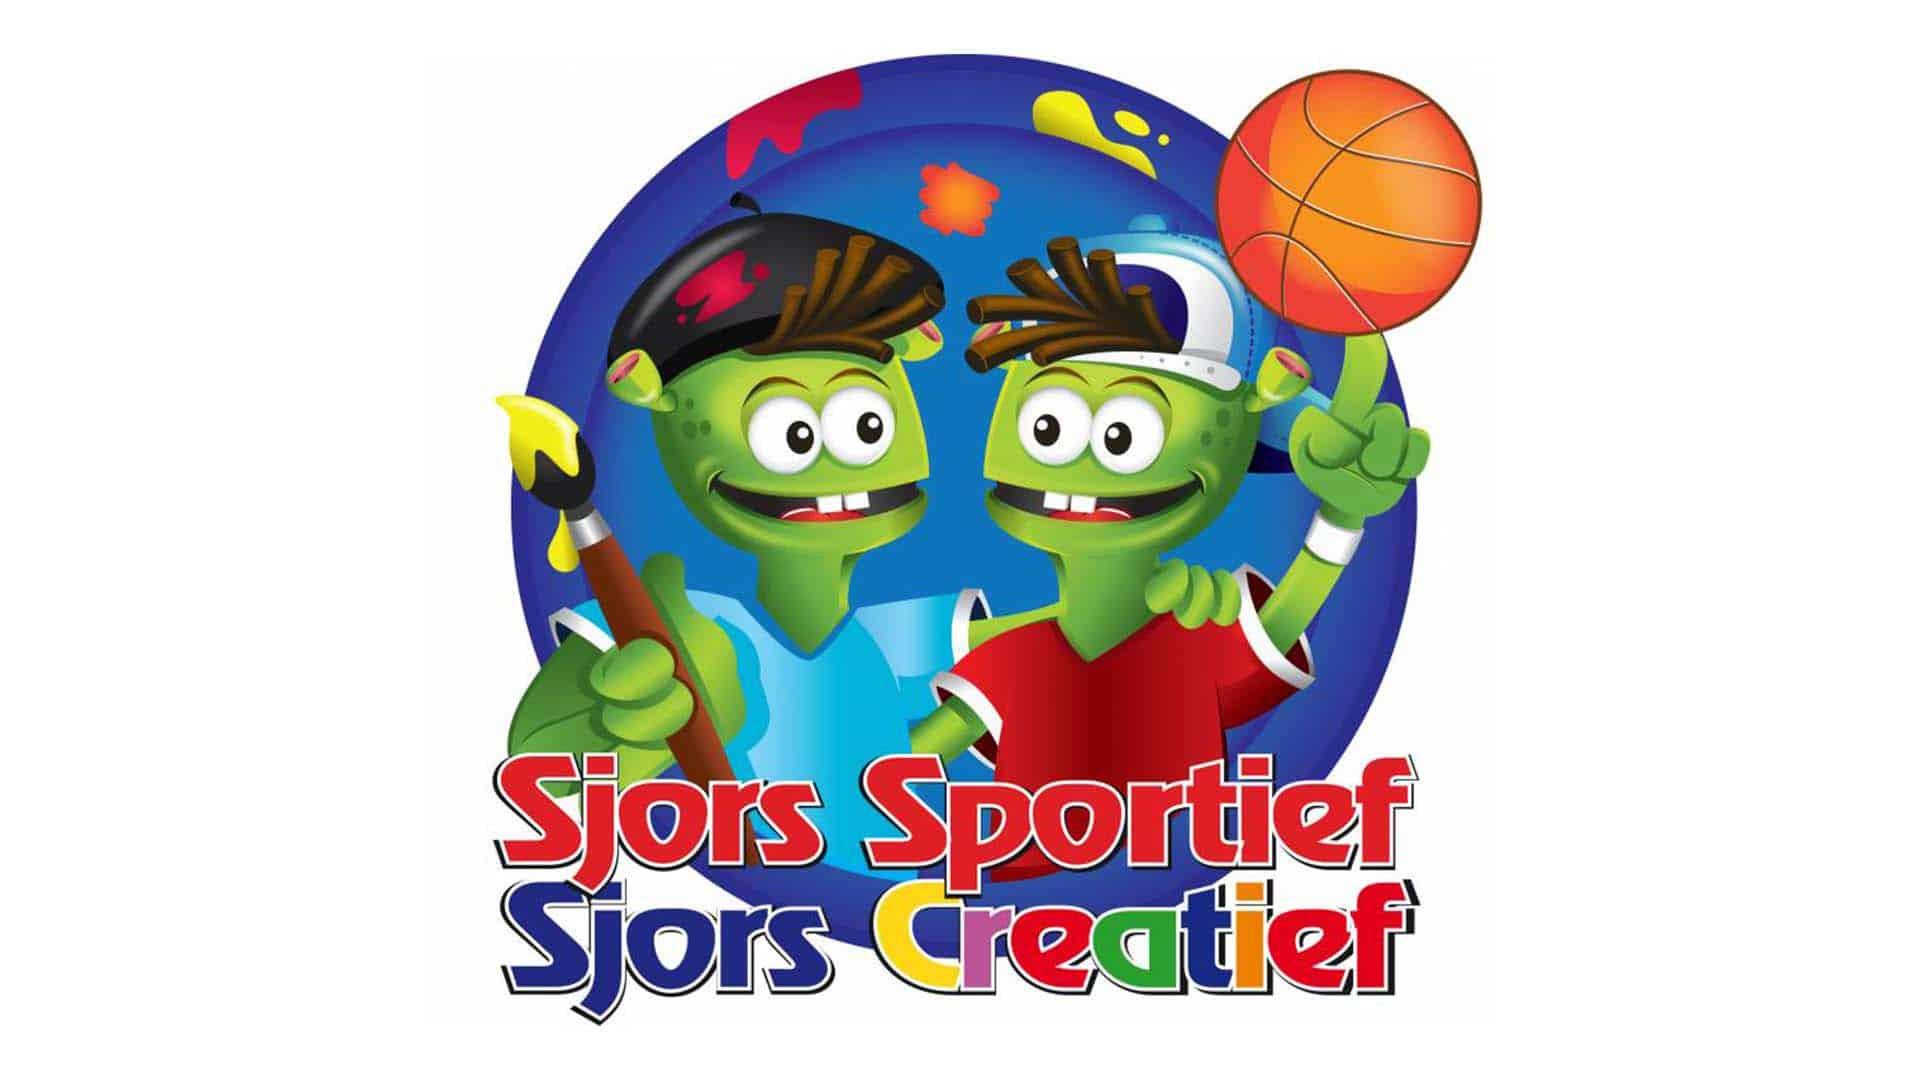 sjors-sportief-1